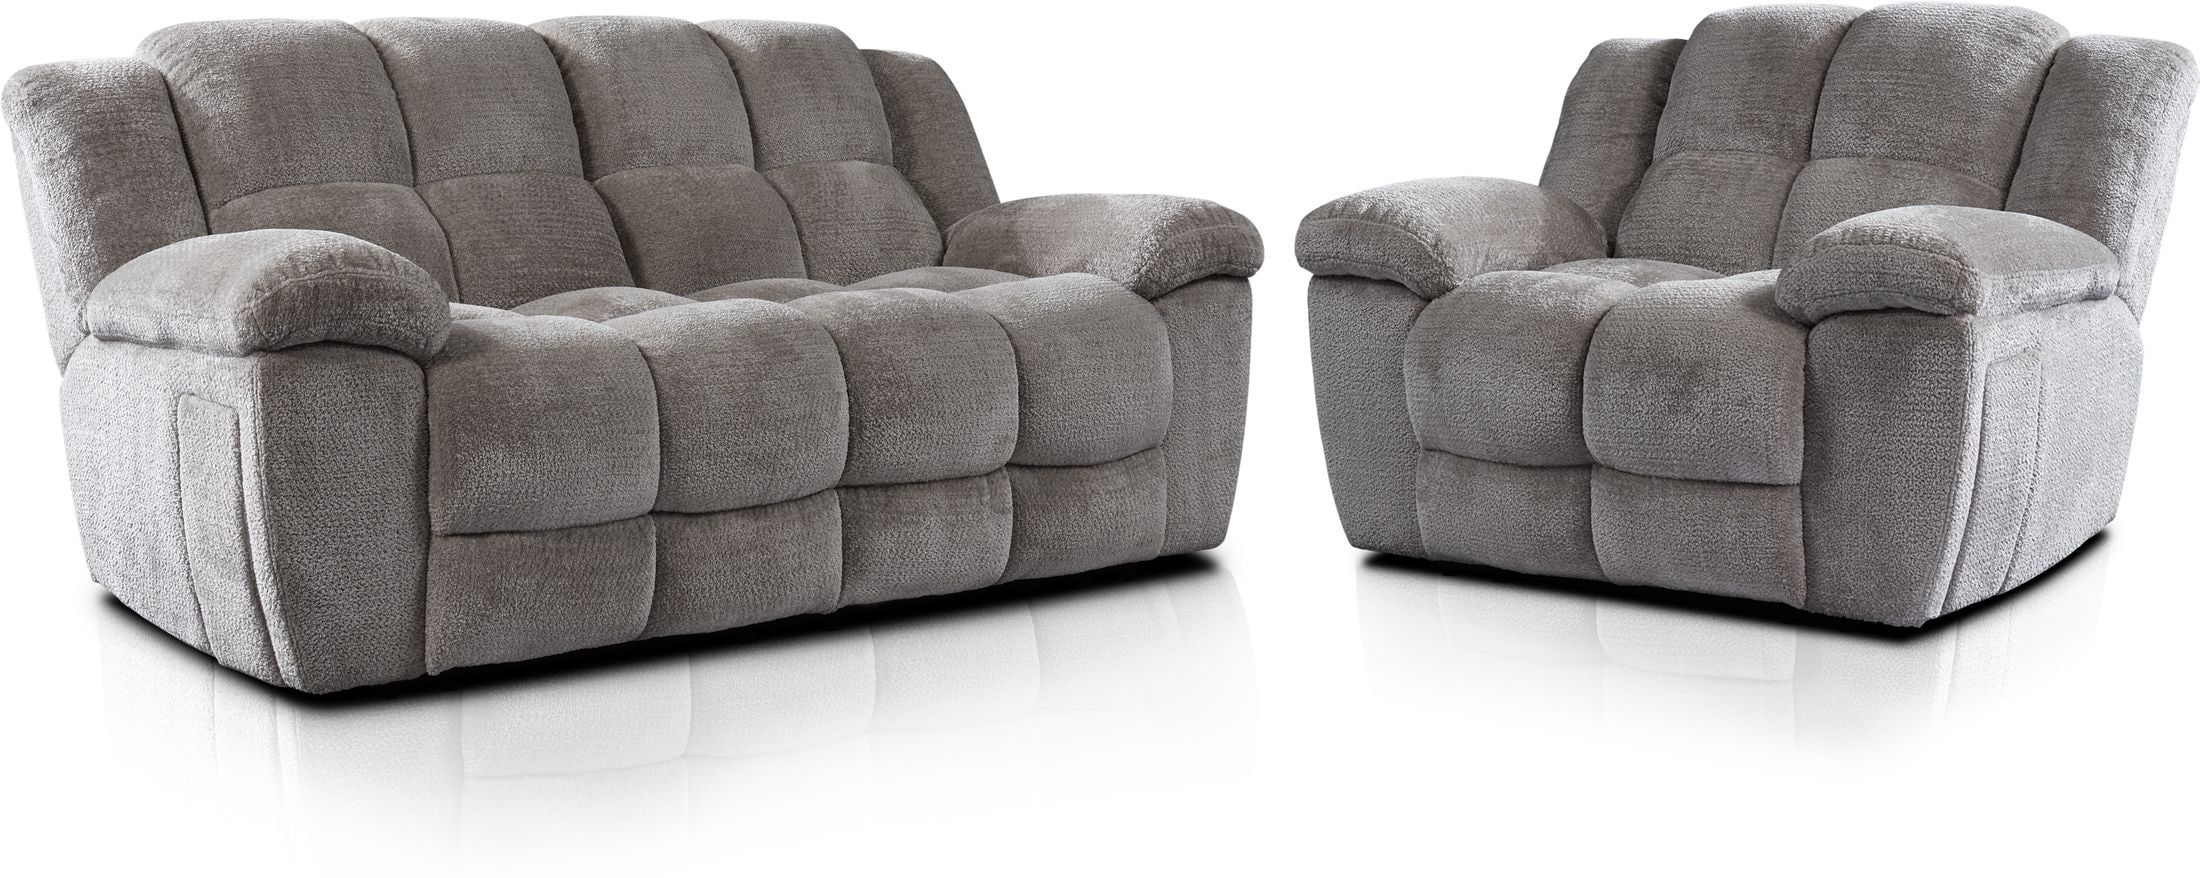 Living Room Furniture - Mellow Manual Reclining Sofa and Recliner Set - Stone